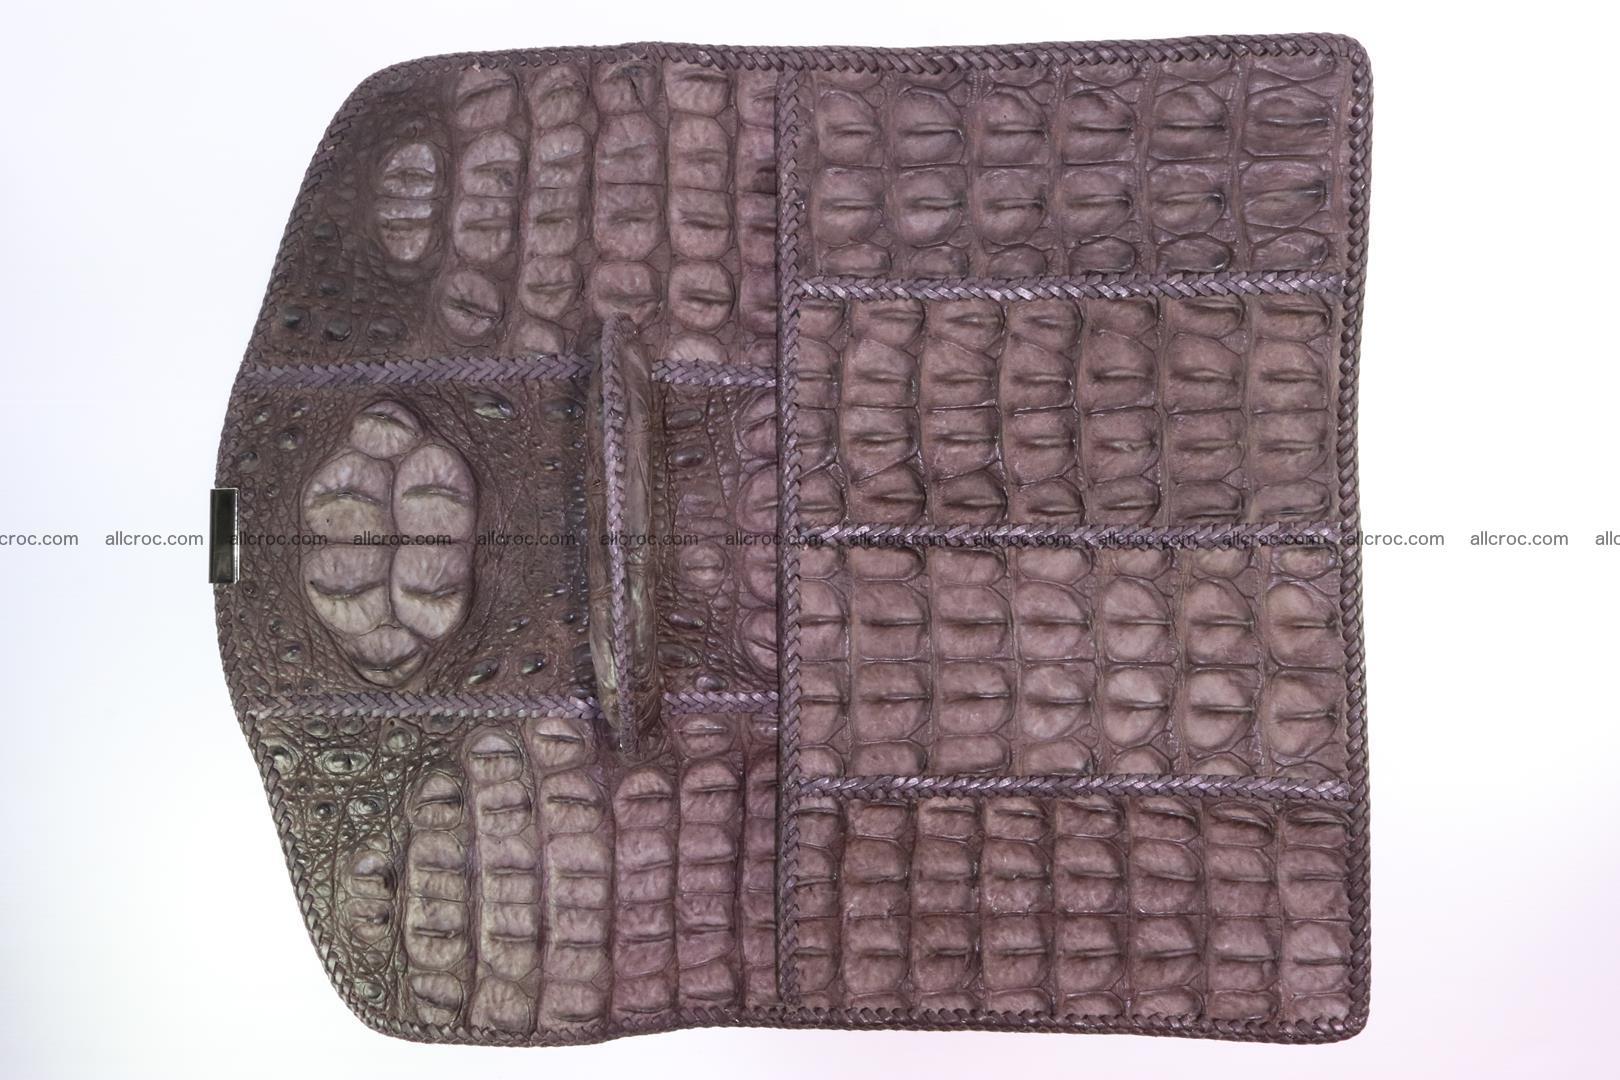 Hand braided crocodile skin briefcase 149 Foto 12